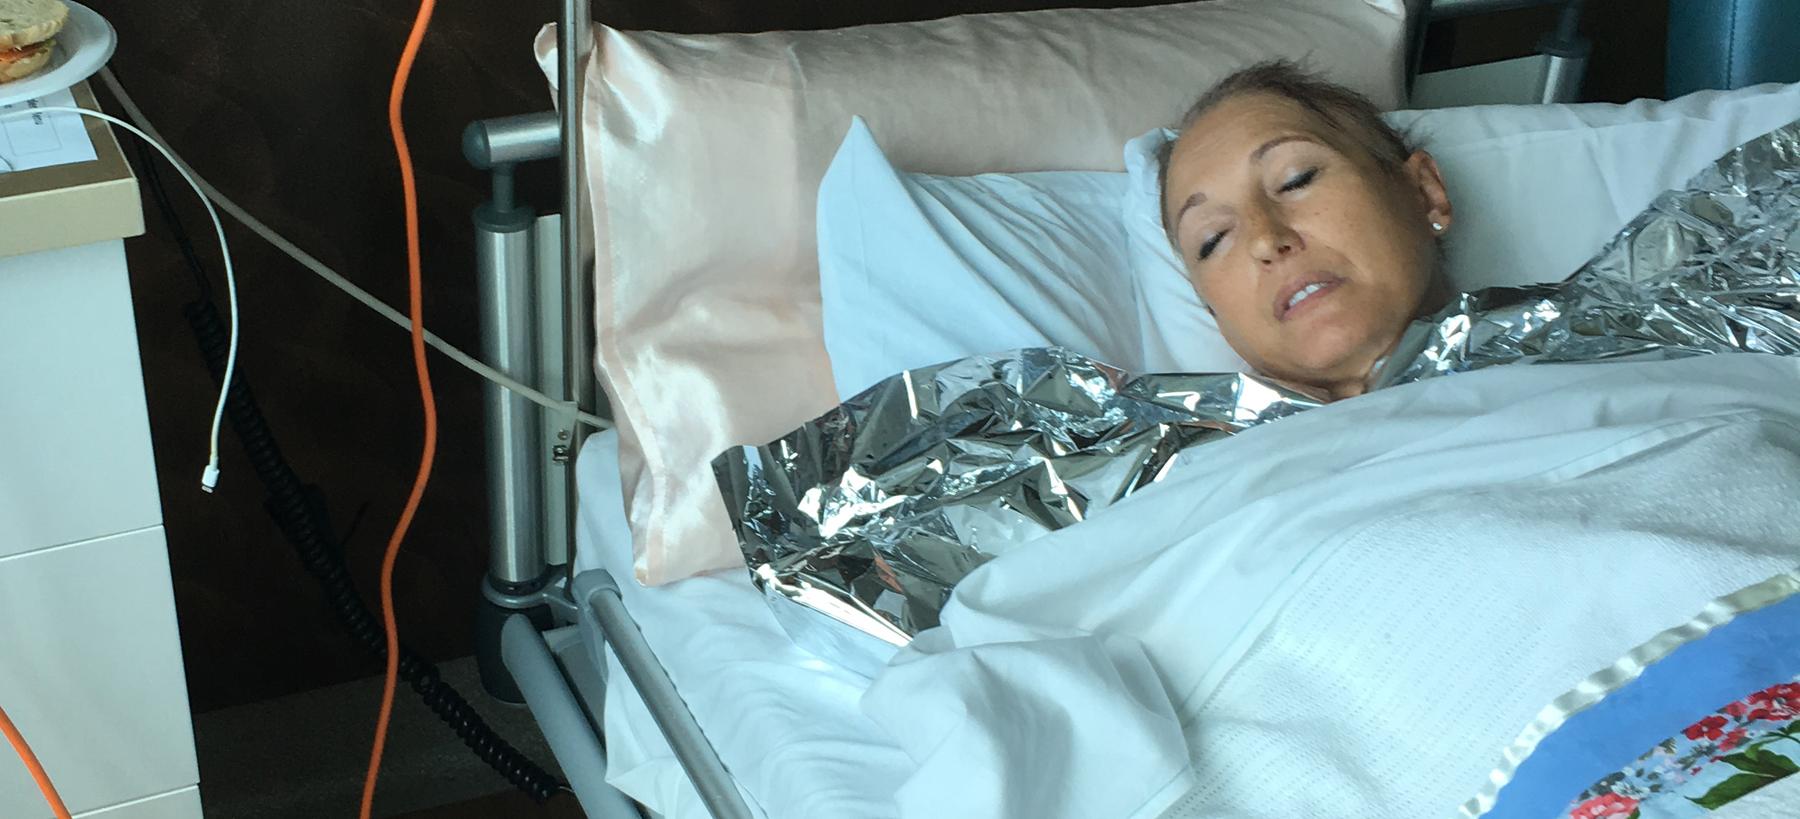 suzi juracic after allograft transplant banner